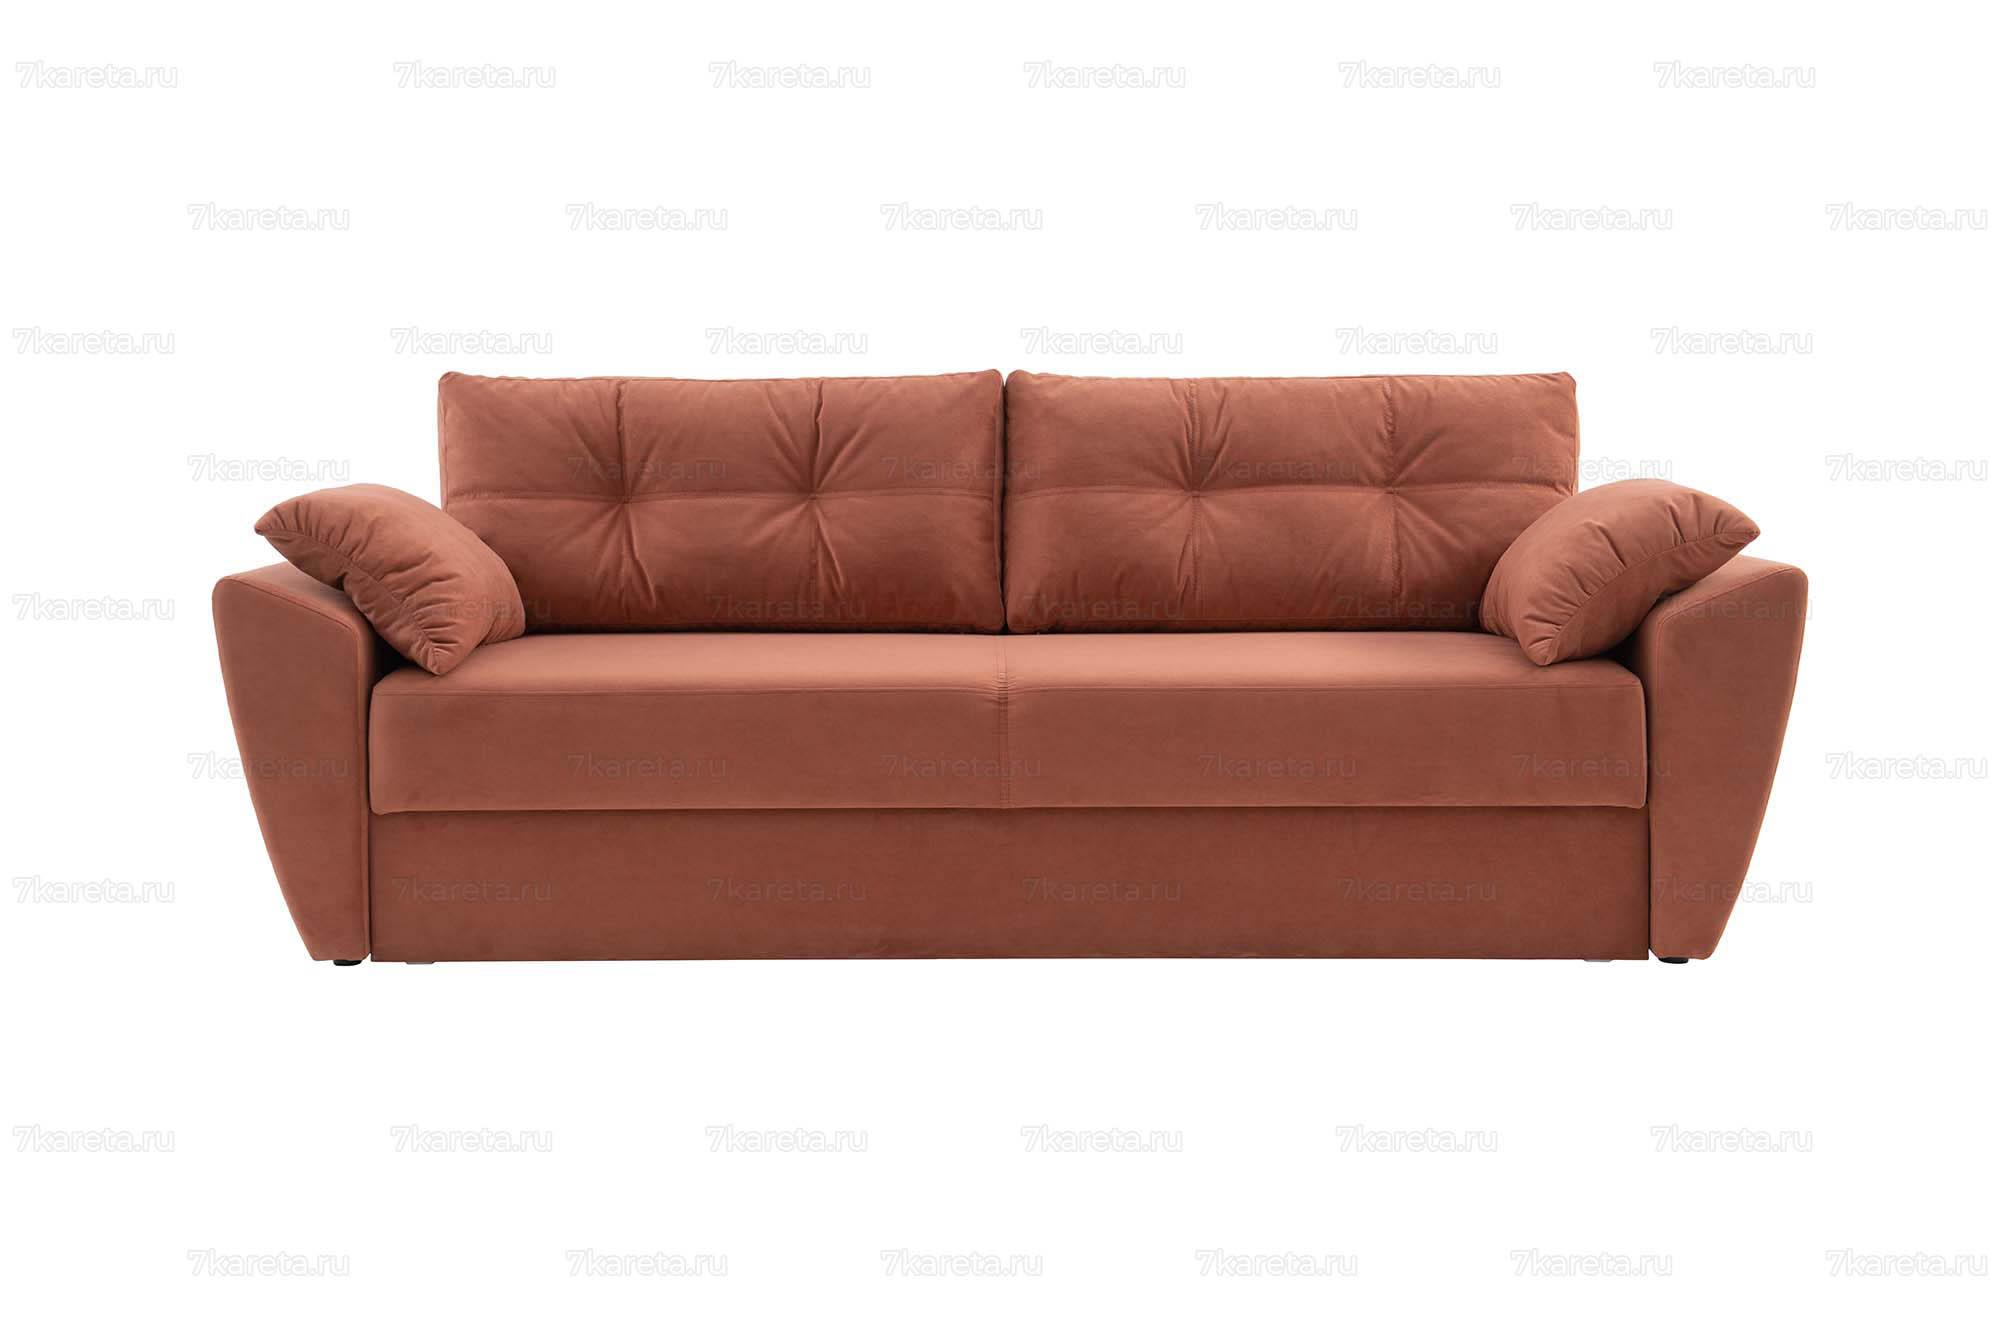 7 Карета диван тик-так Амстердам